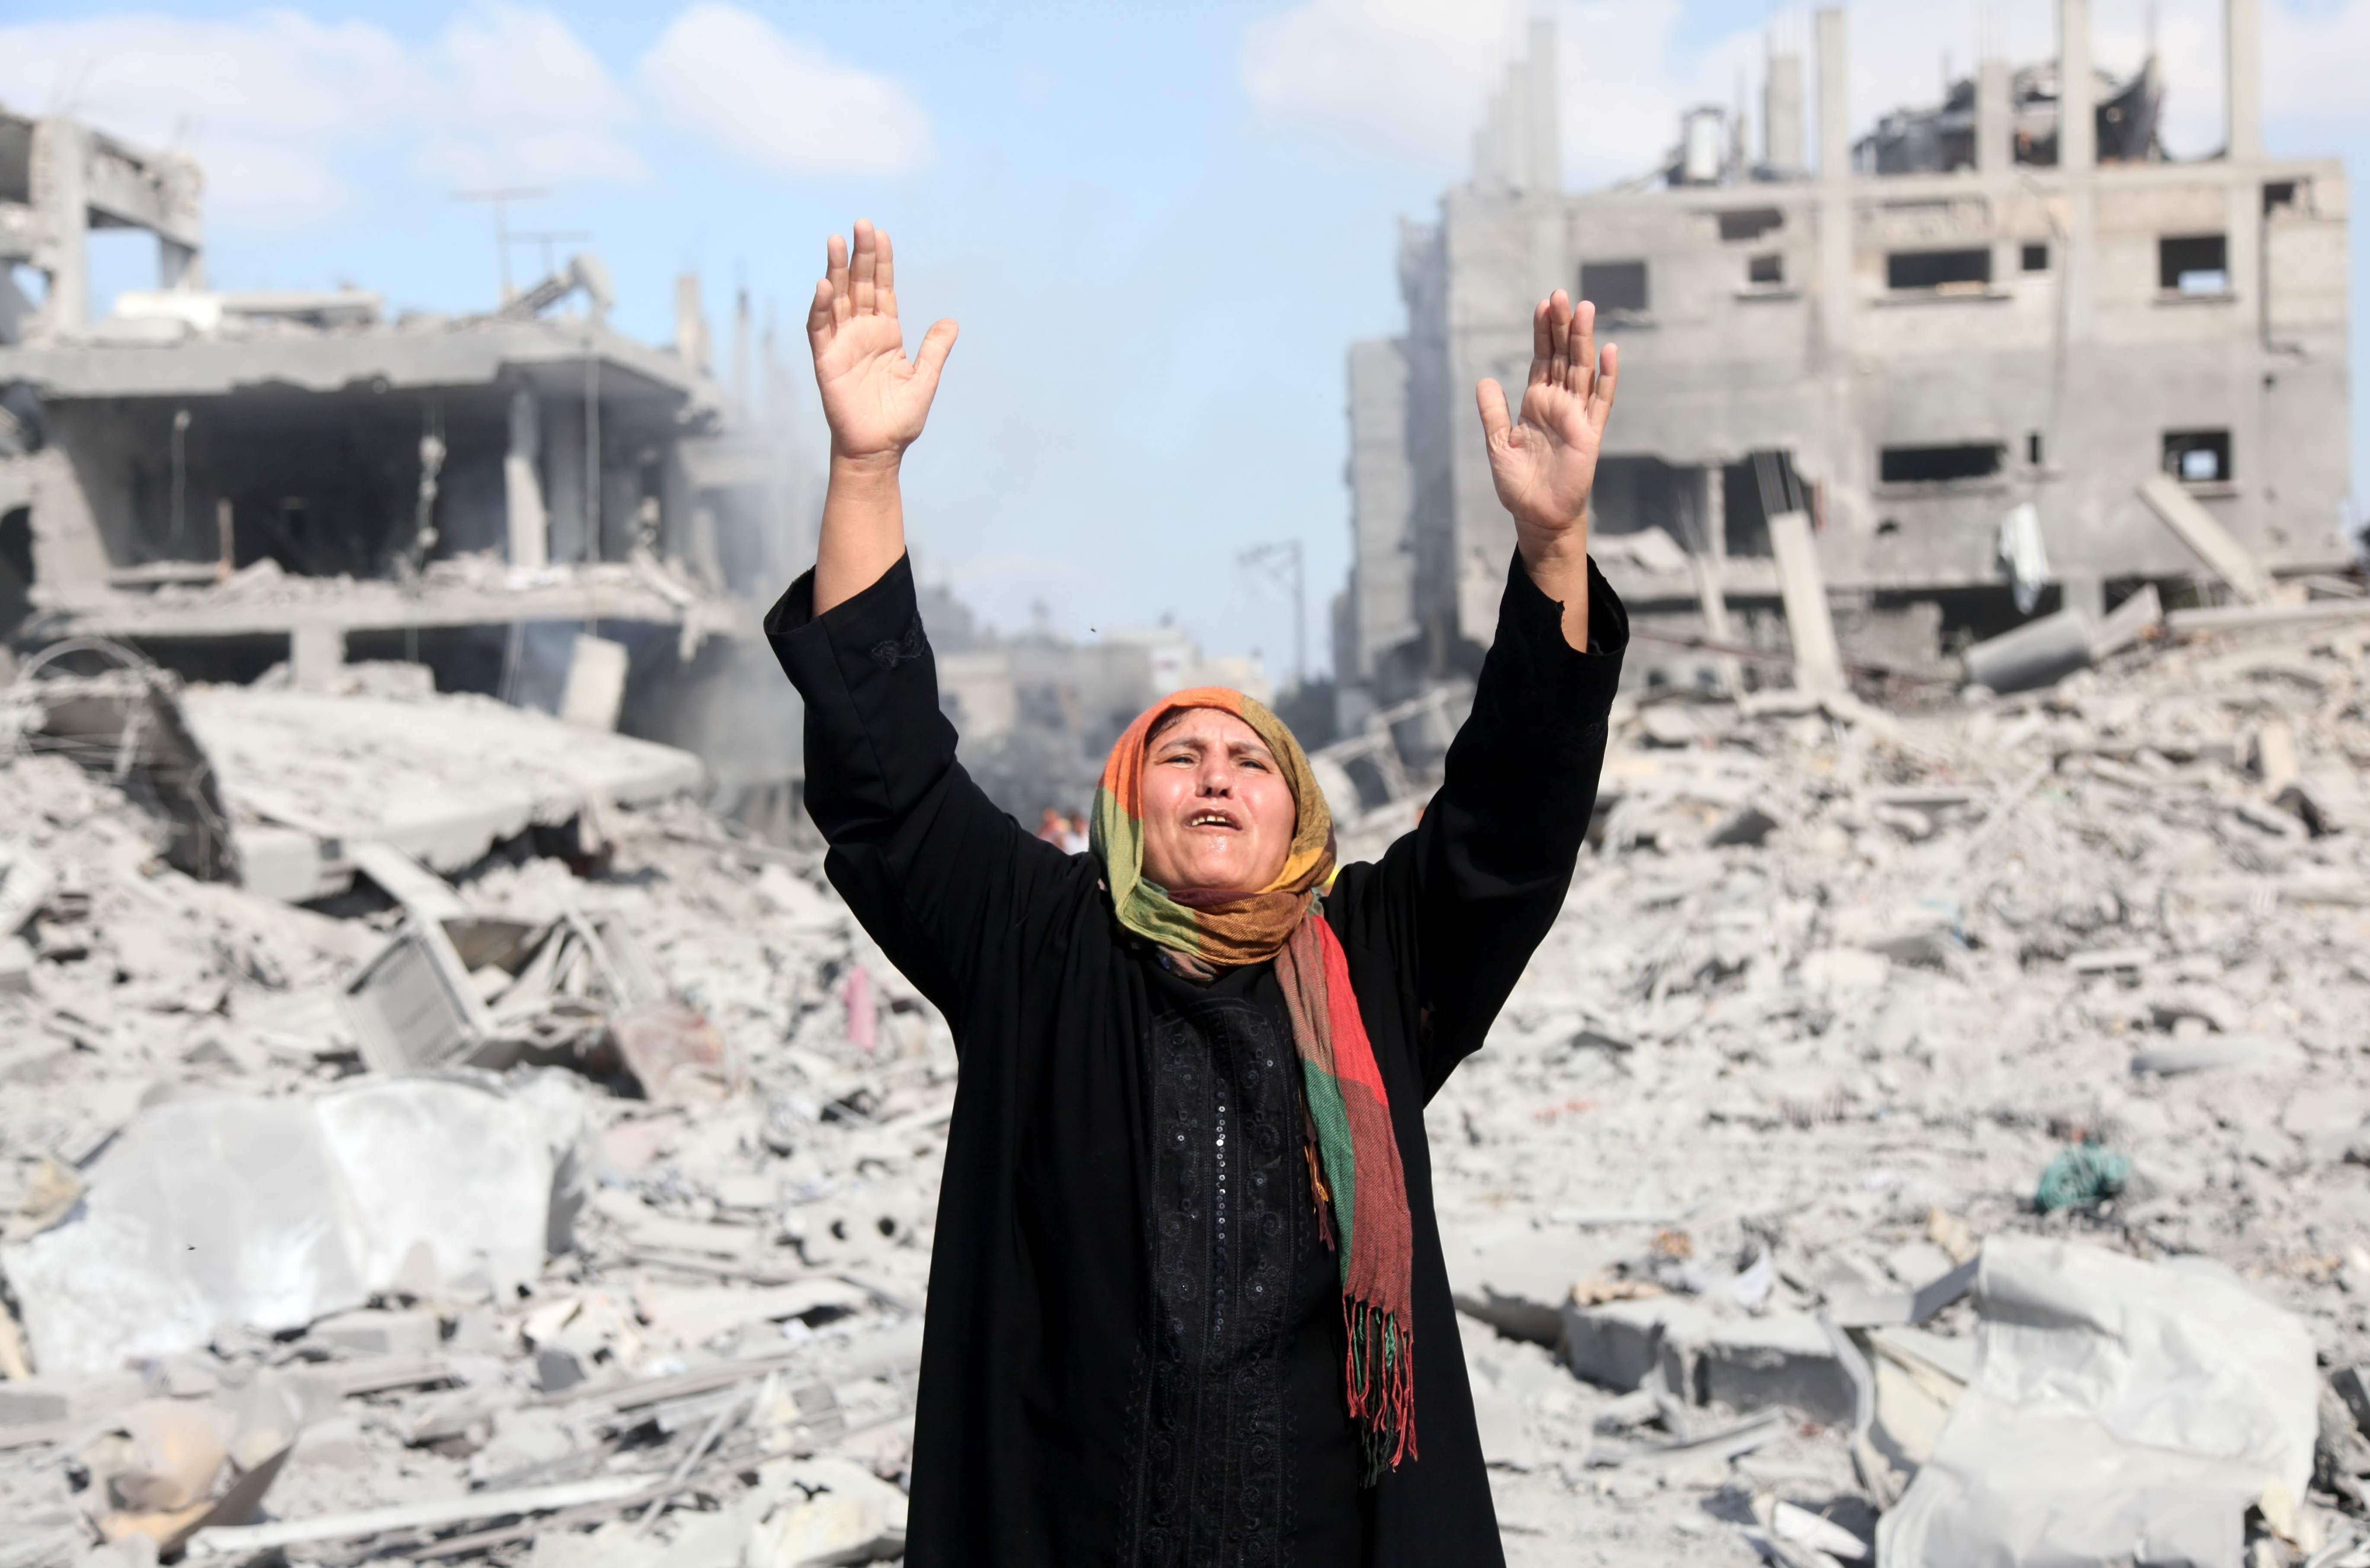 Curtea Penala Internationala va examina posibile crime de razboi comise in Palestina. Israel: Este o decizie scandaloasa